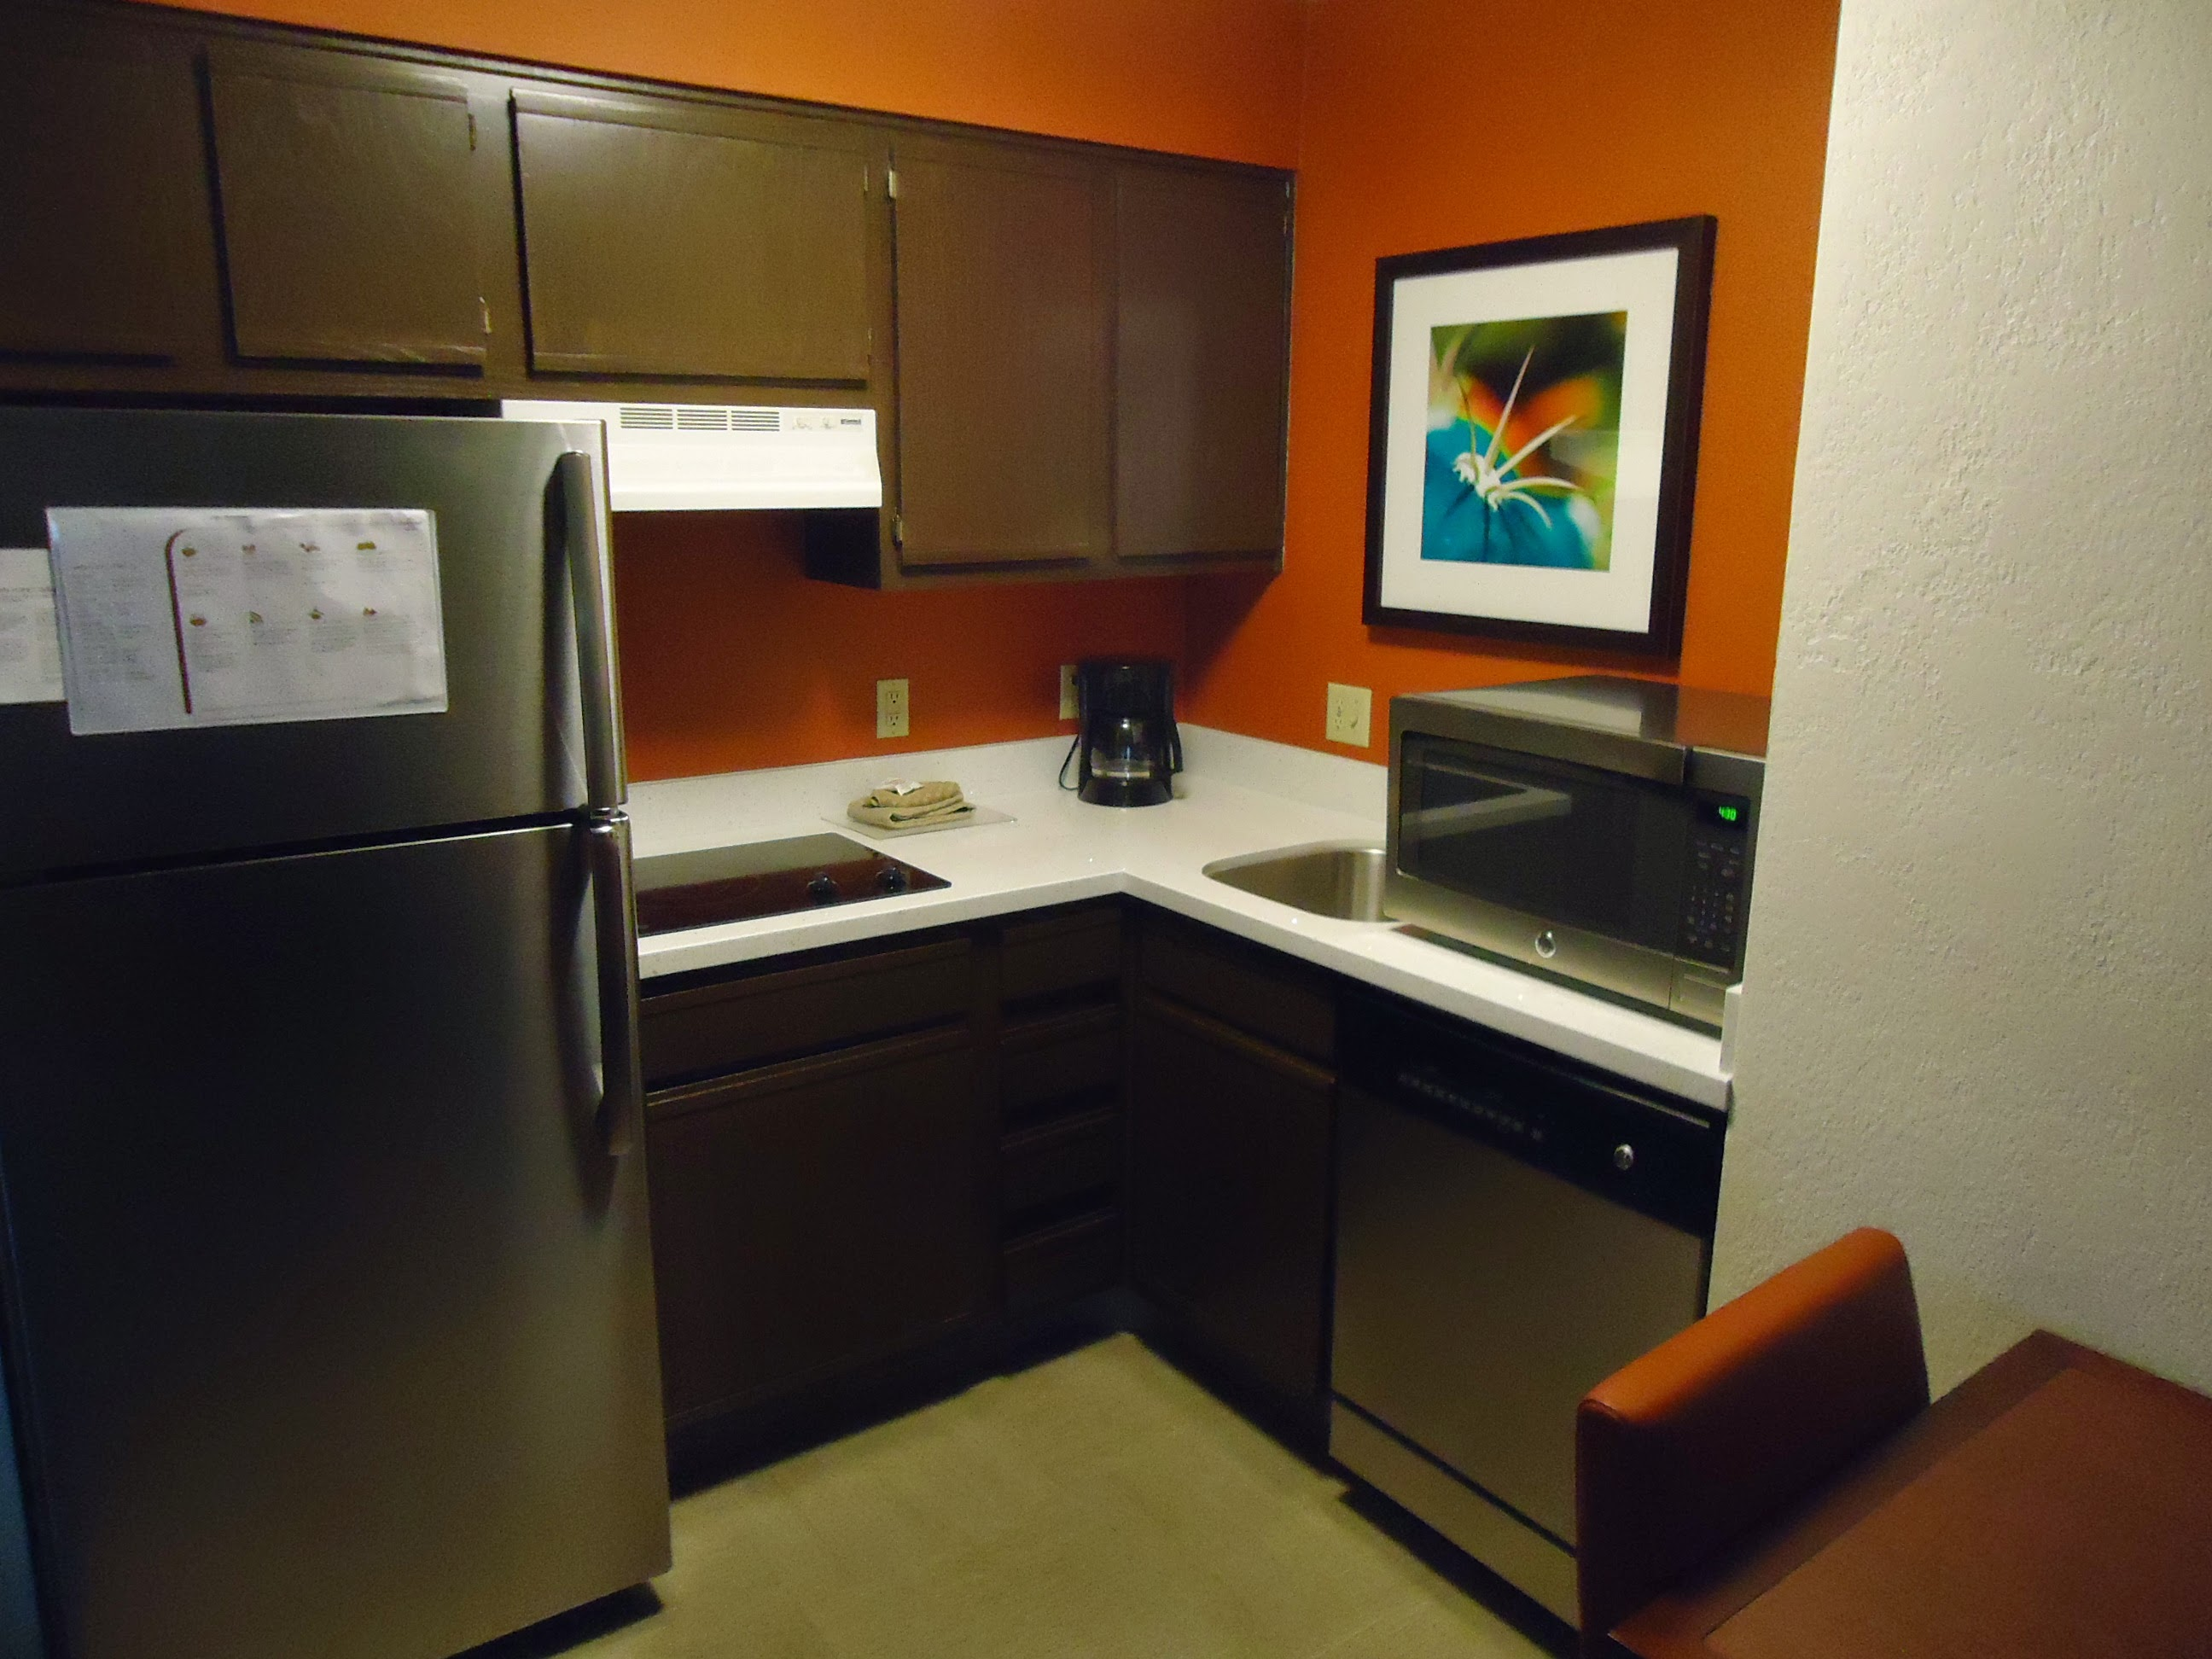 amazing honolulu kitchen info on hotels hotel with donatz oahu regarding for